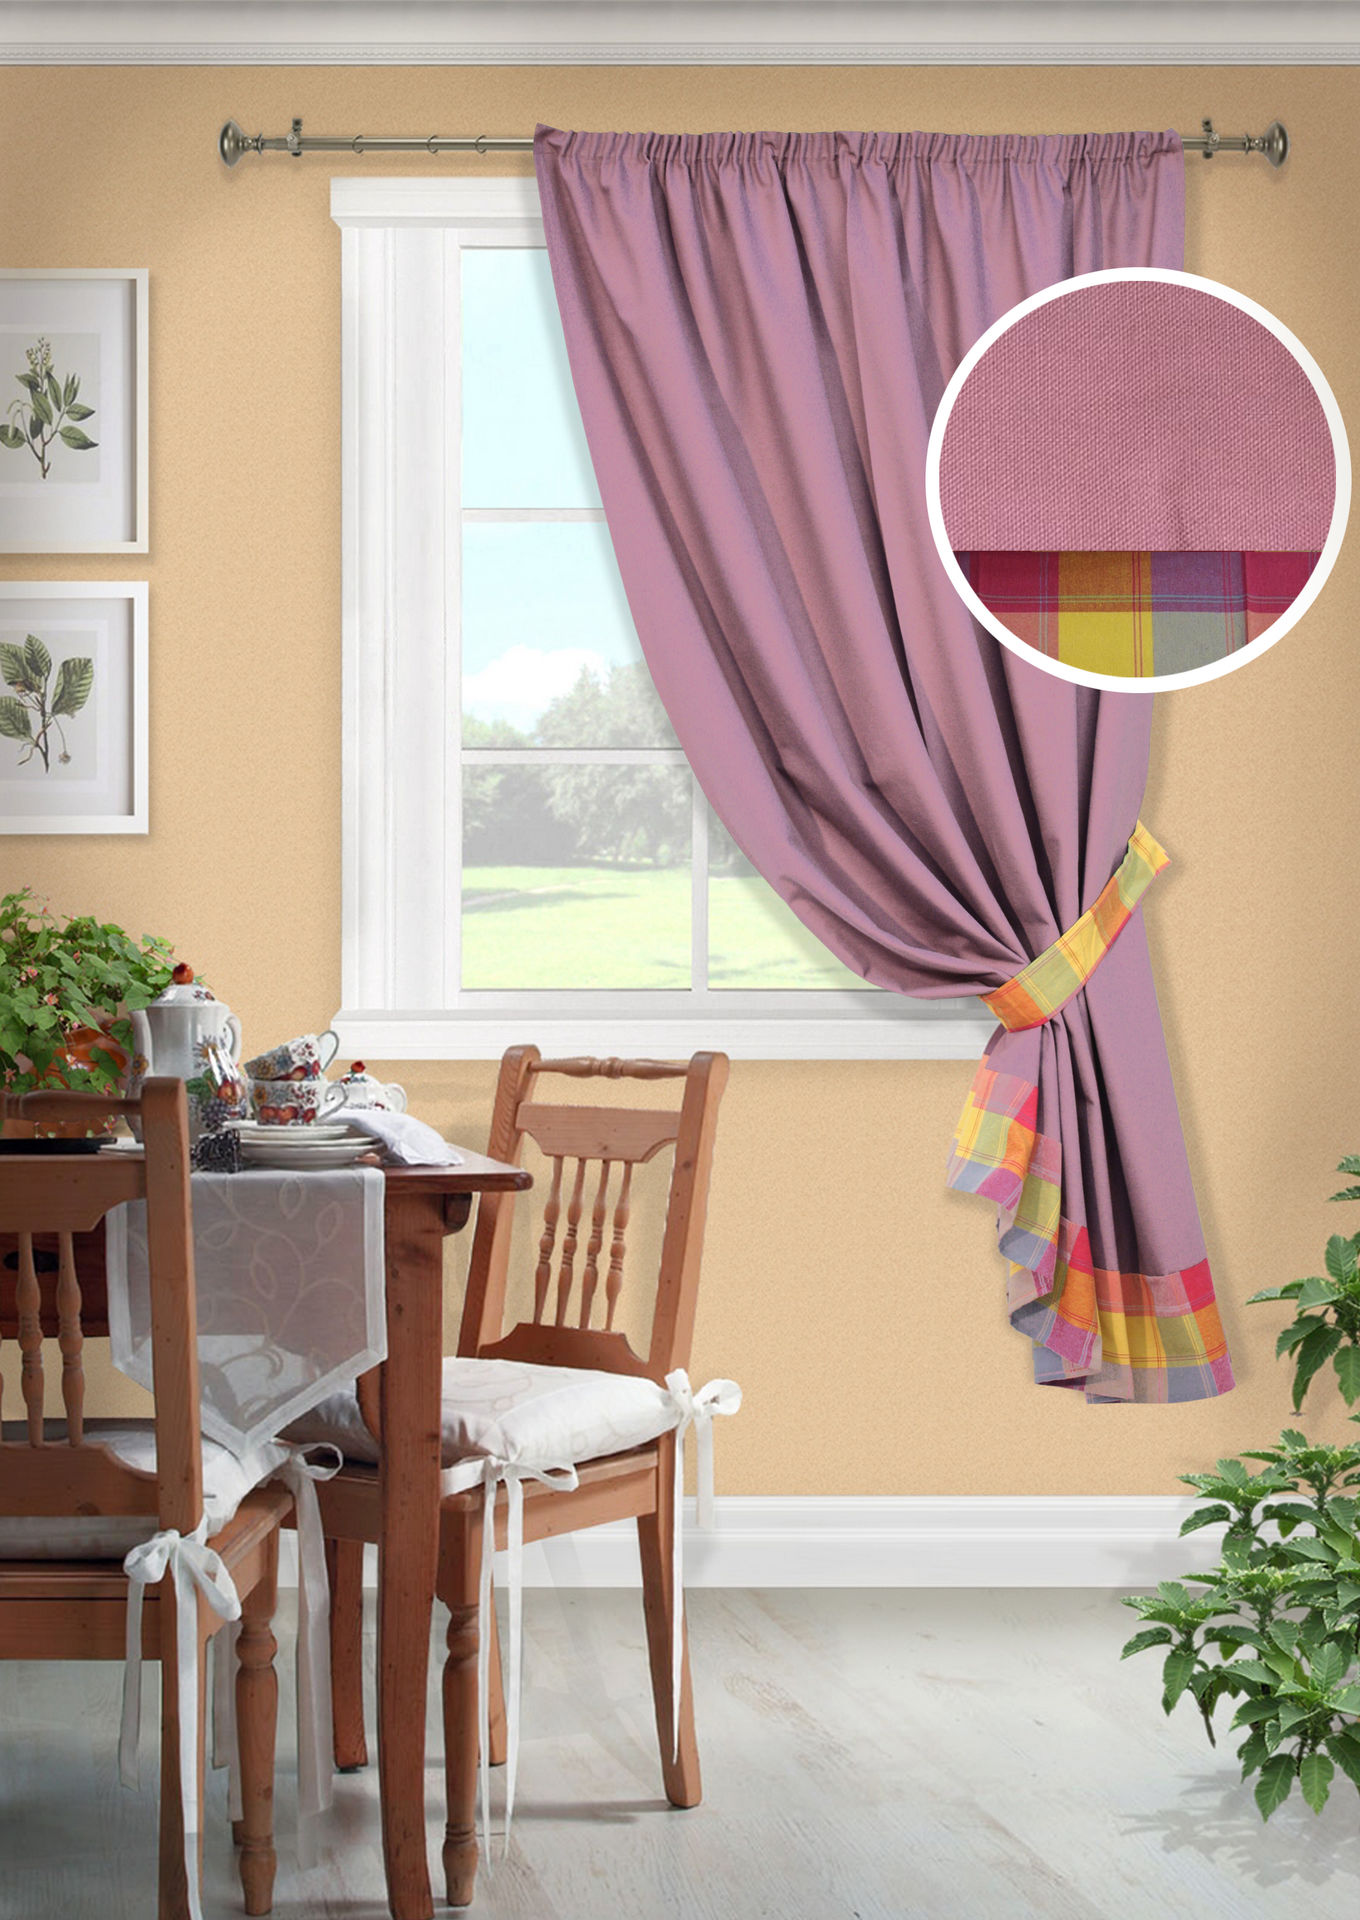 Шторы Kauffort Классические шторы Monpasie Цвет: Фиолетовый шторы интерьерные kauffort штора provence k на тесьме 136х175